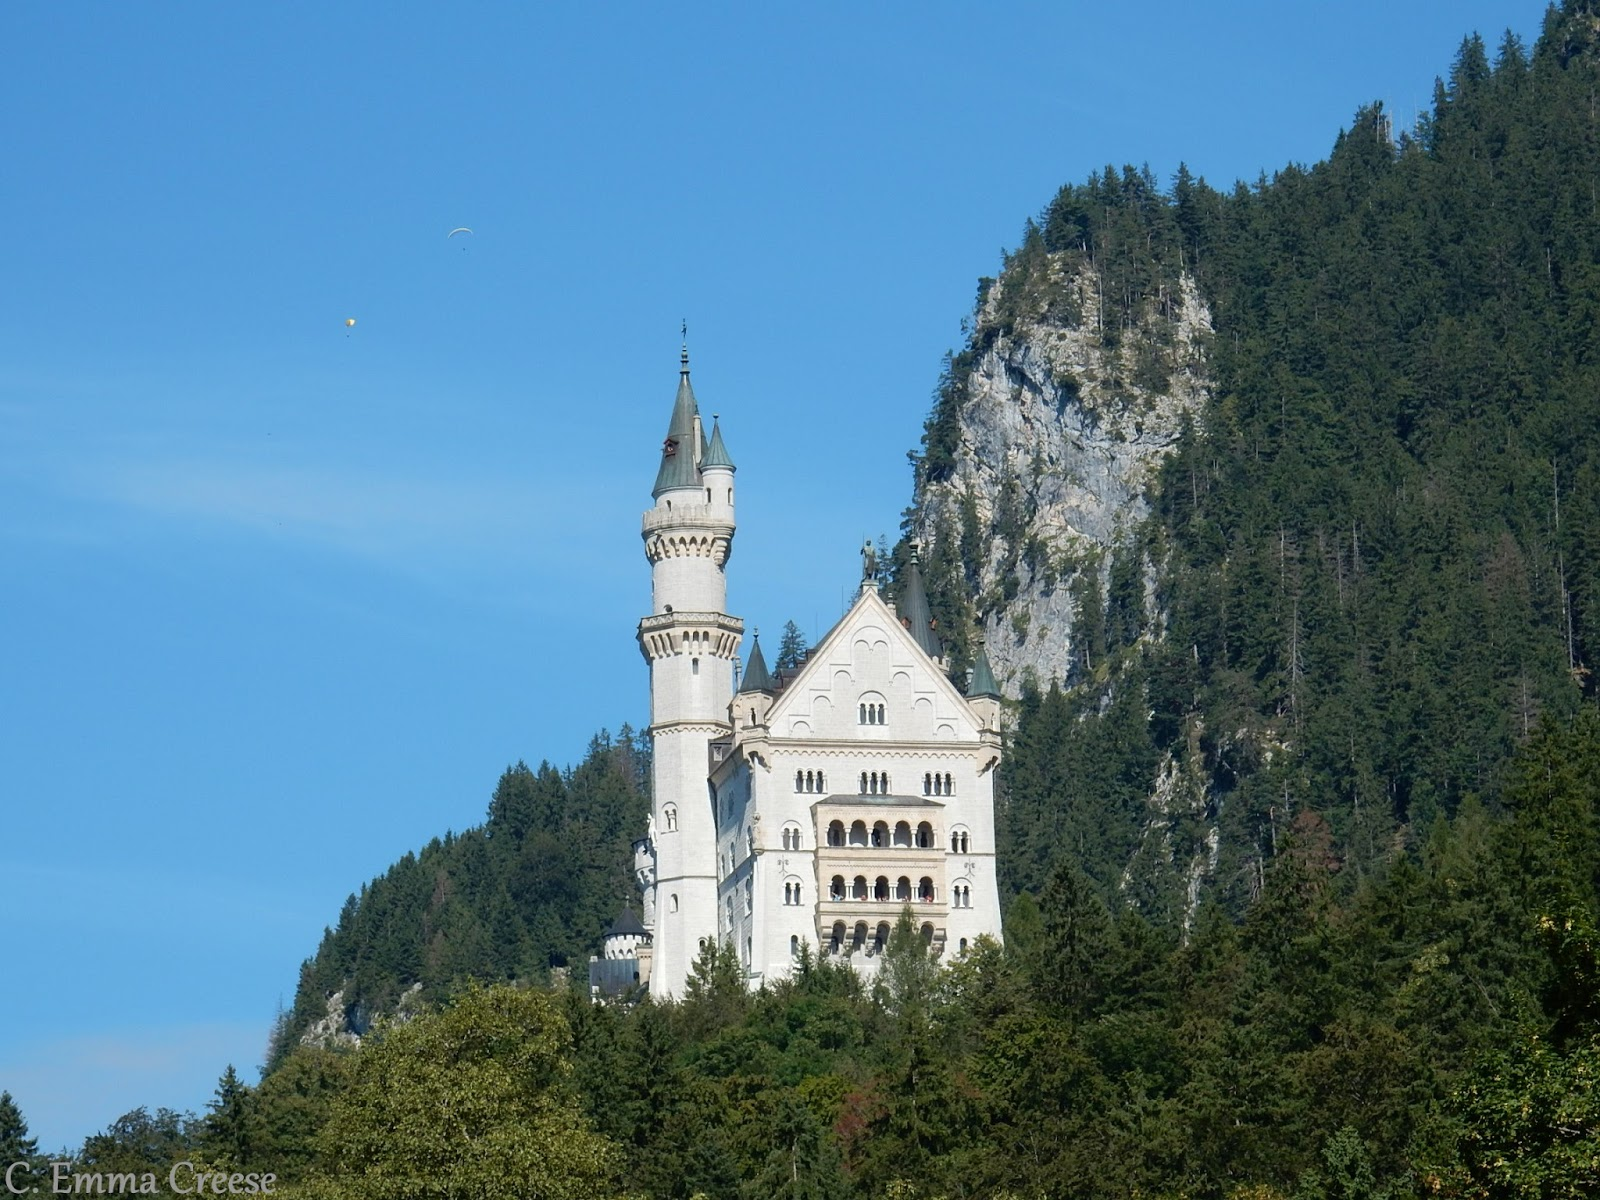 Neuschwanstein Castle Fussen Bavarian Germany Adventures of a London Kiwi